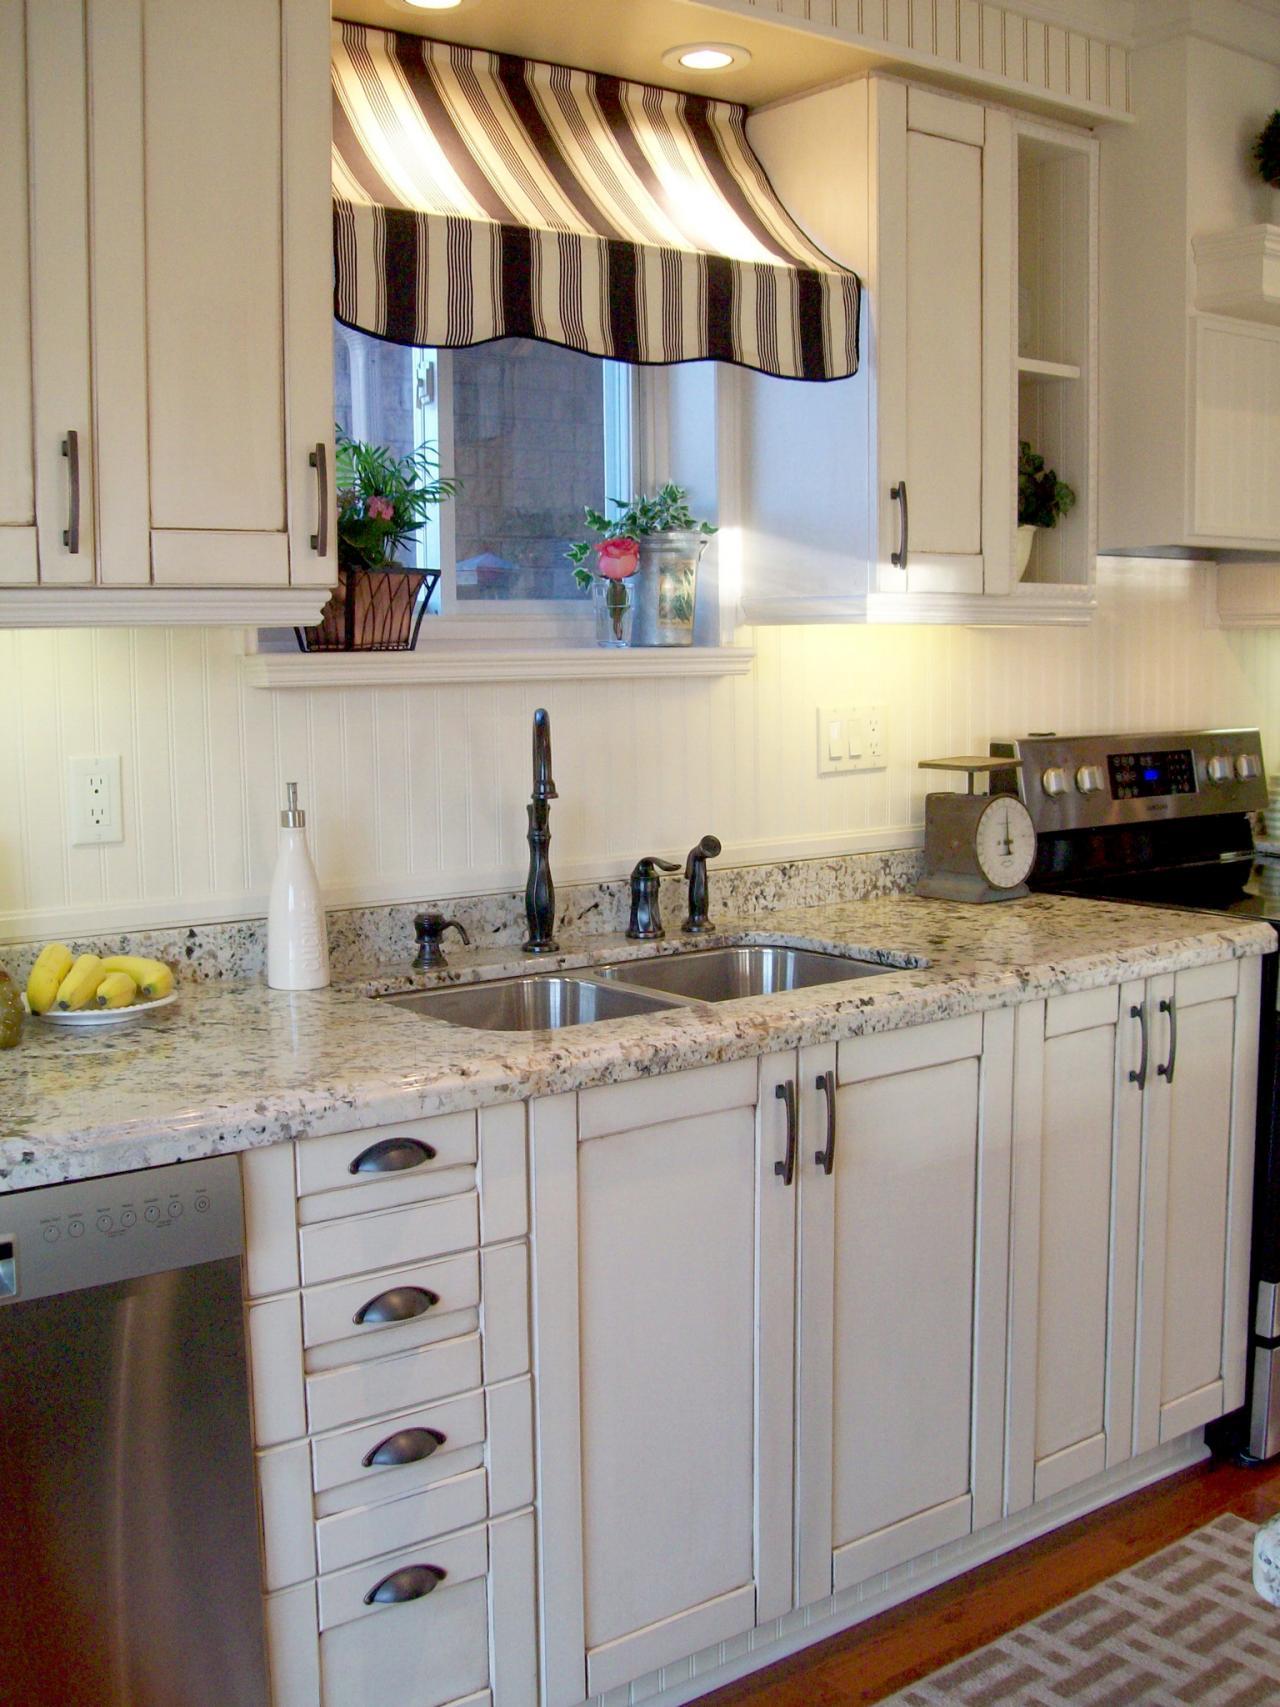 kitchen decor ideas cafe kitchen decorating ideas TDHXTSH